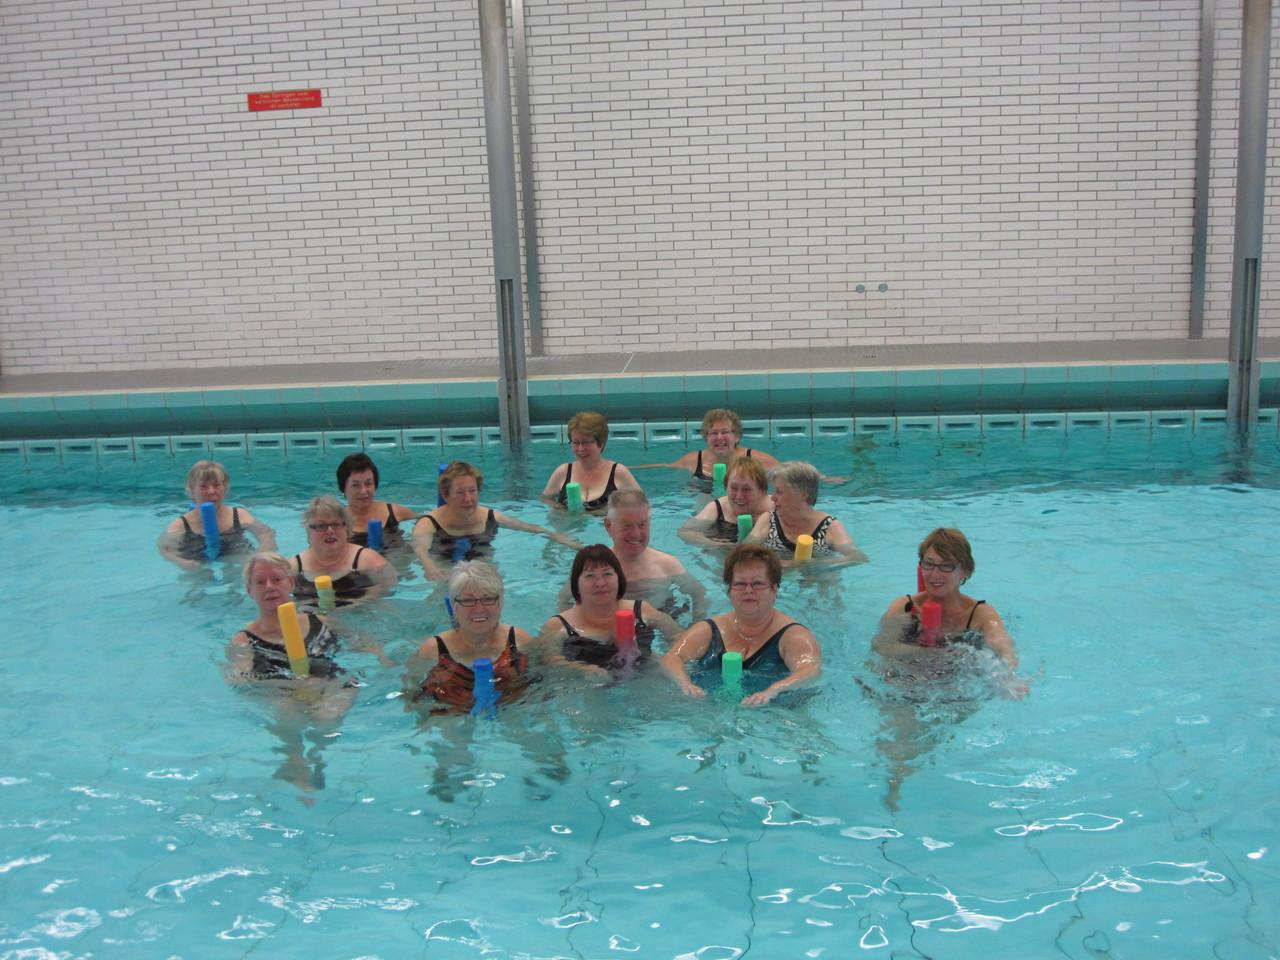 Wassergymnastik im Bürgerbad macht Spaß